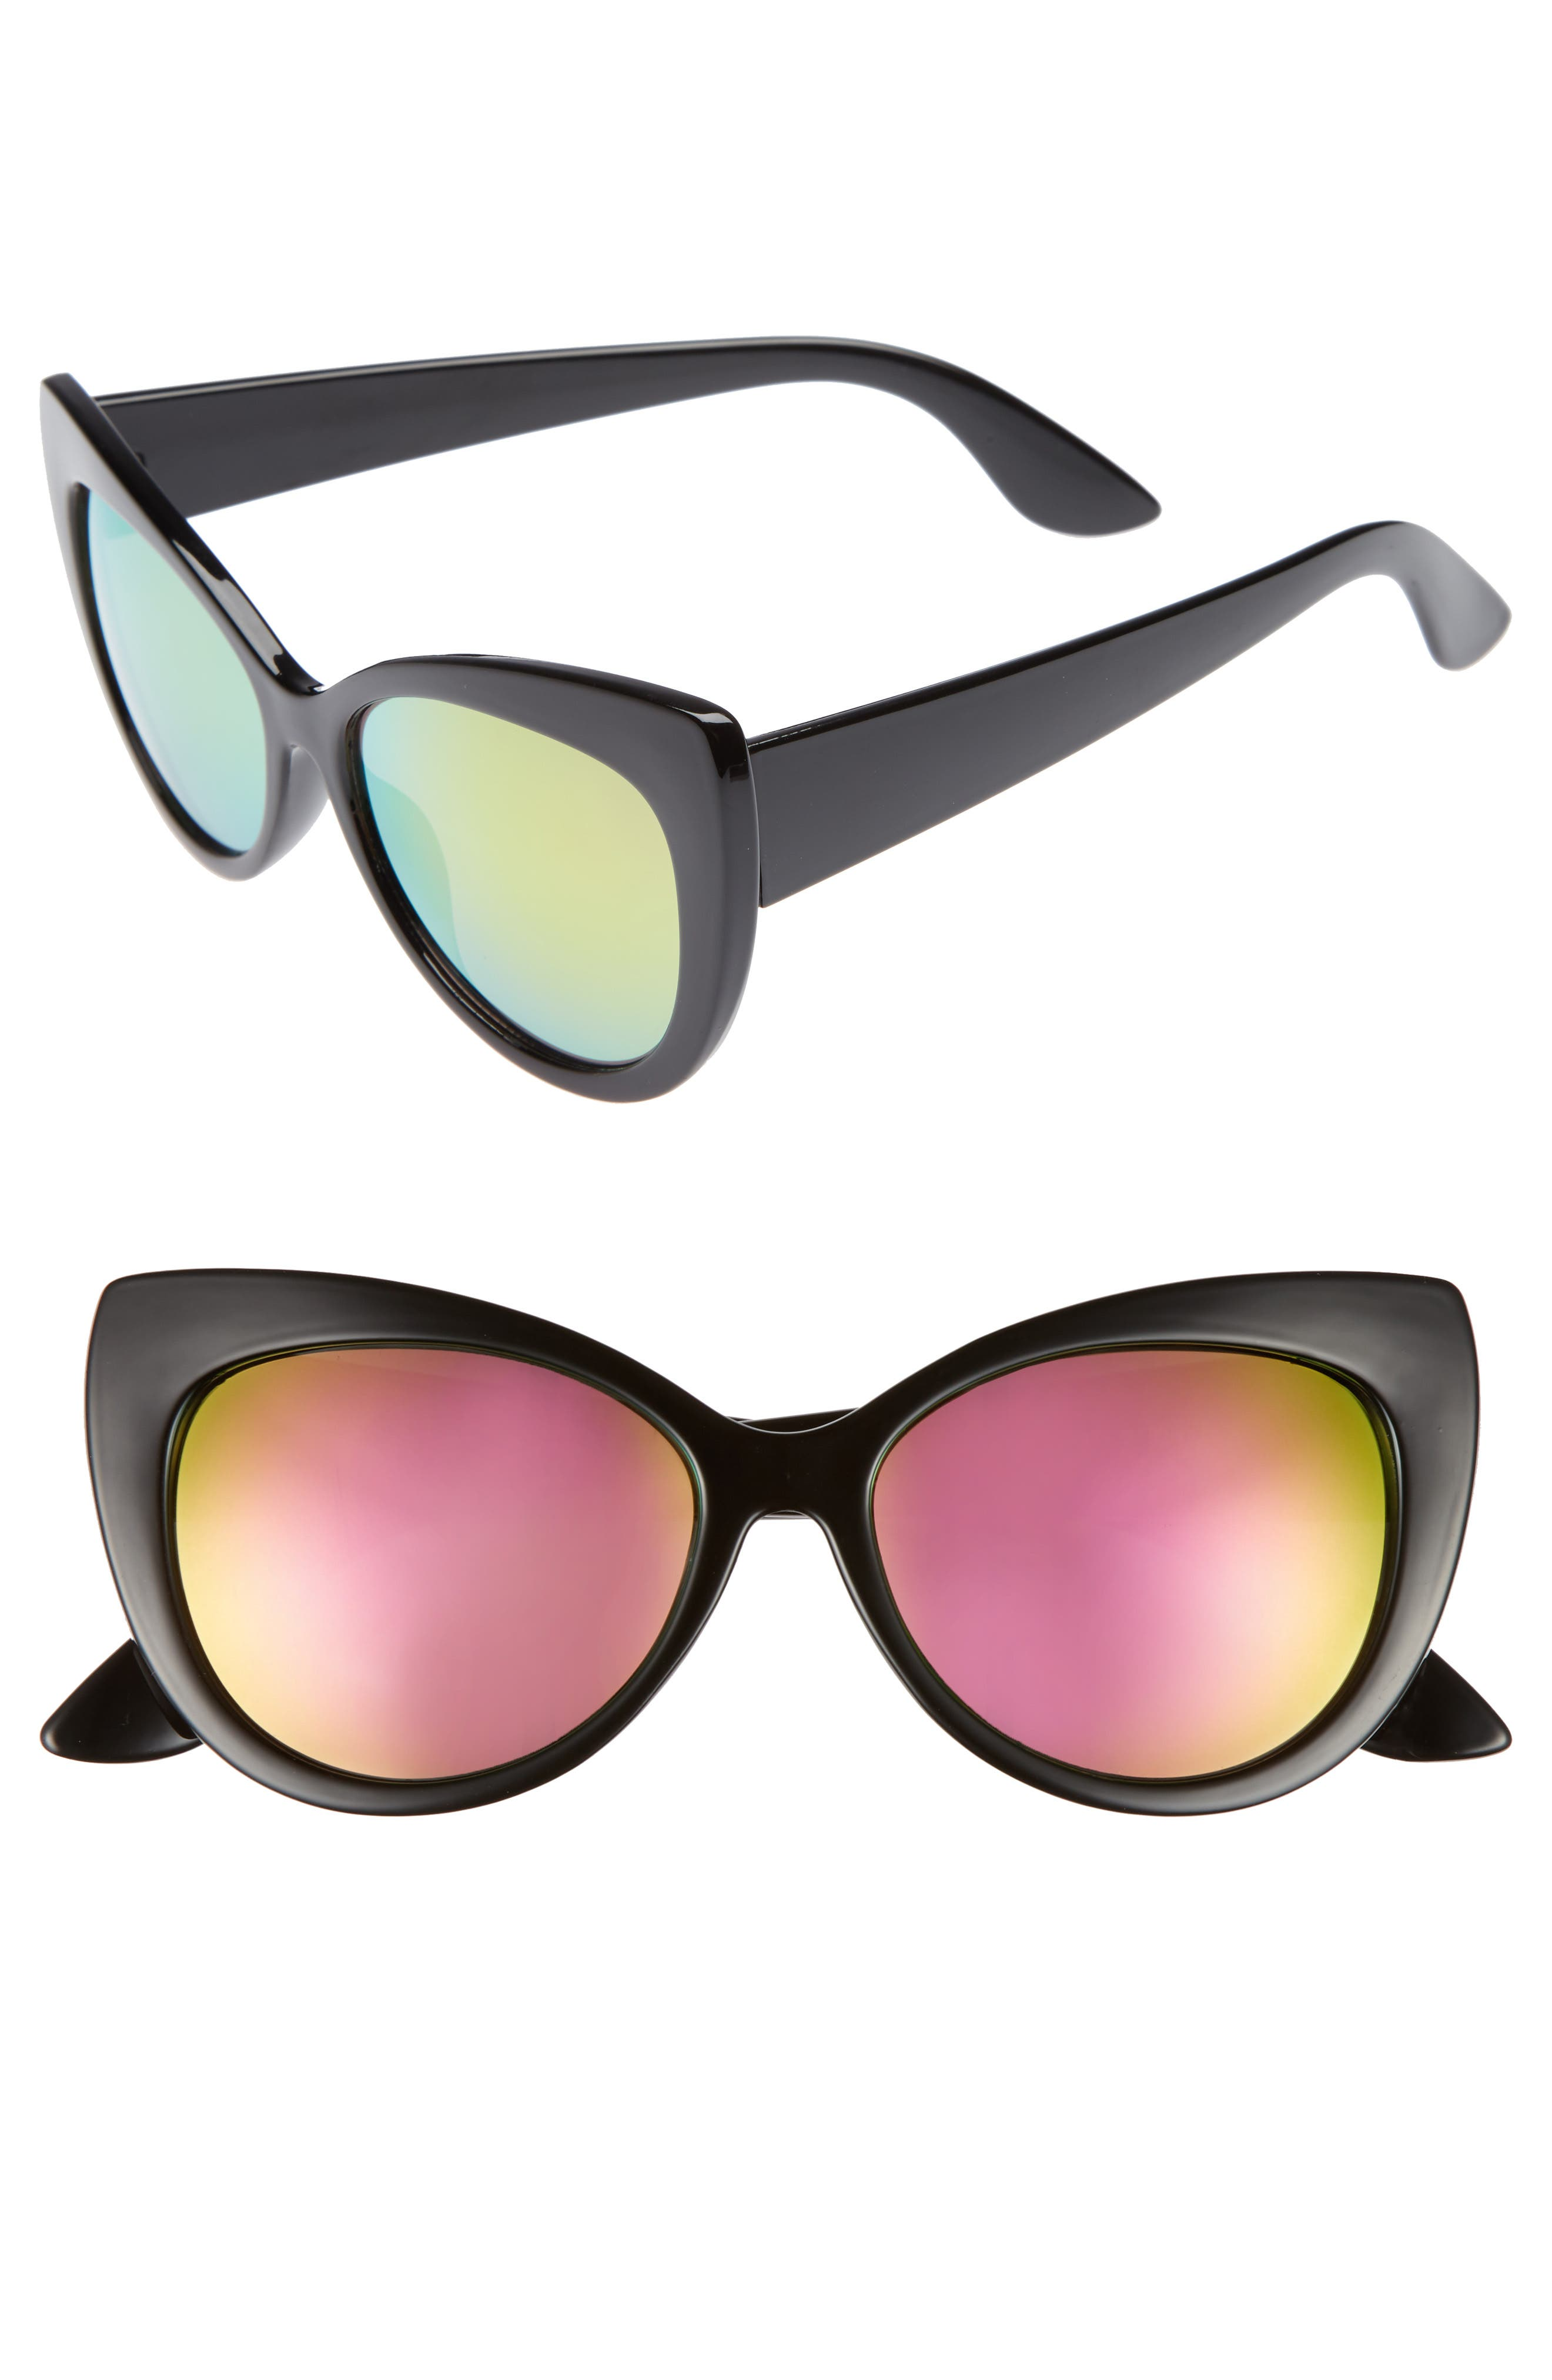 BP 55mm Mirrored Cat Eye Sunglasses,                         Main,                         color, Black